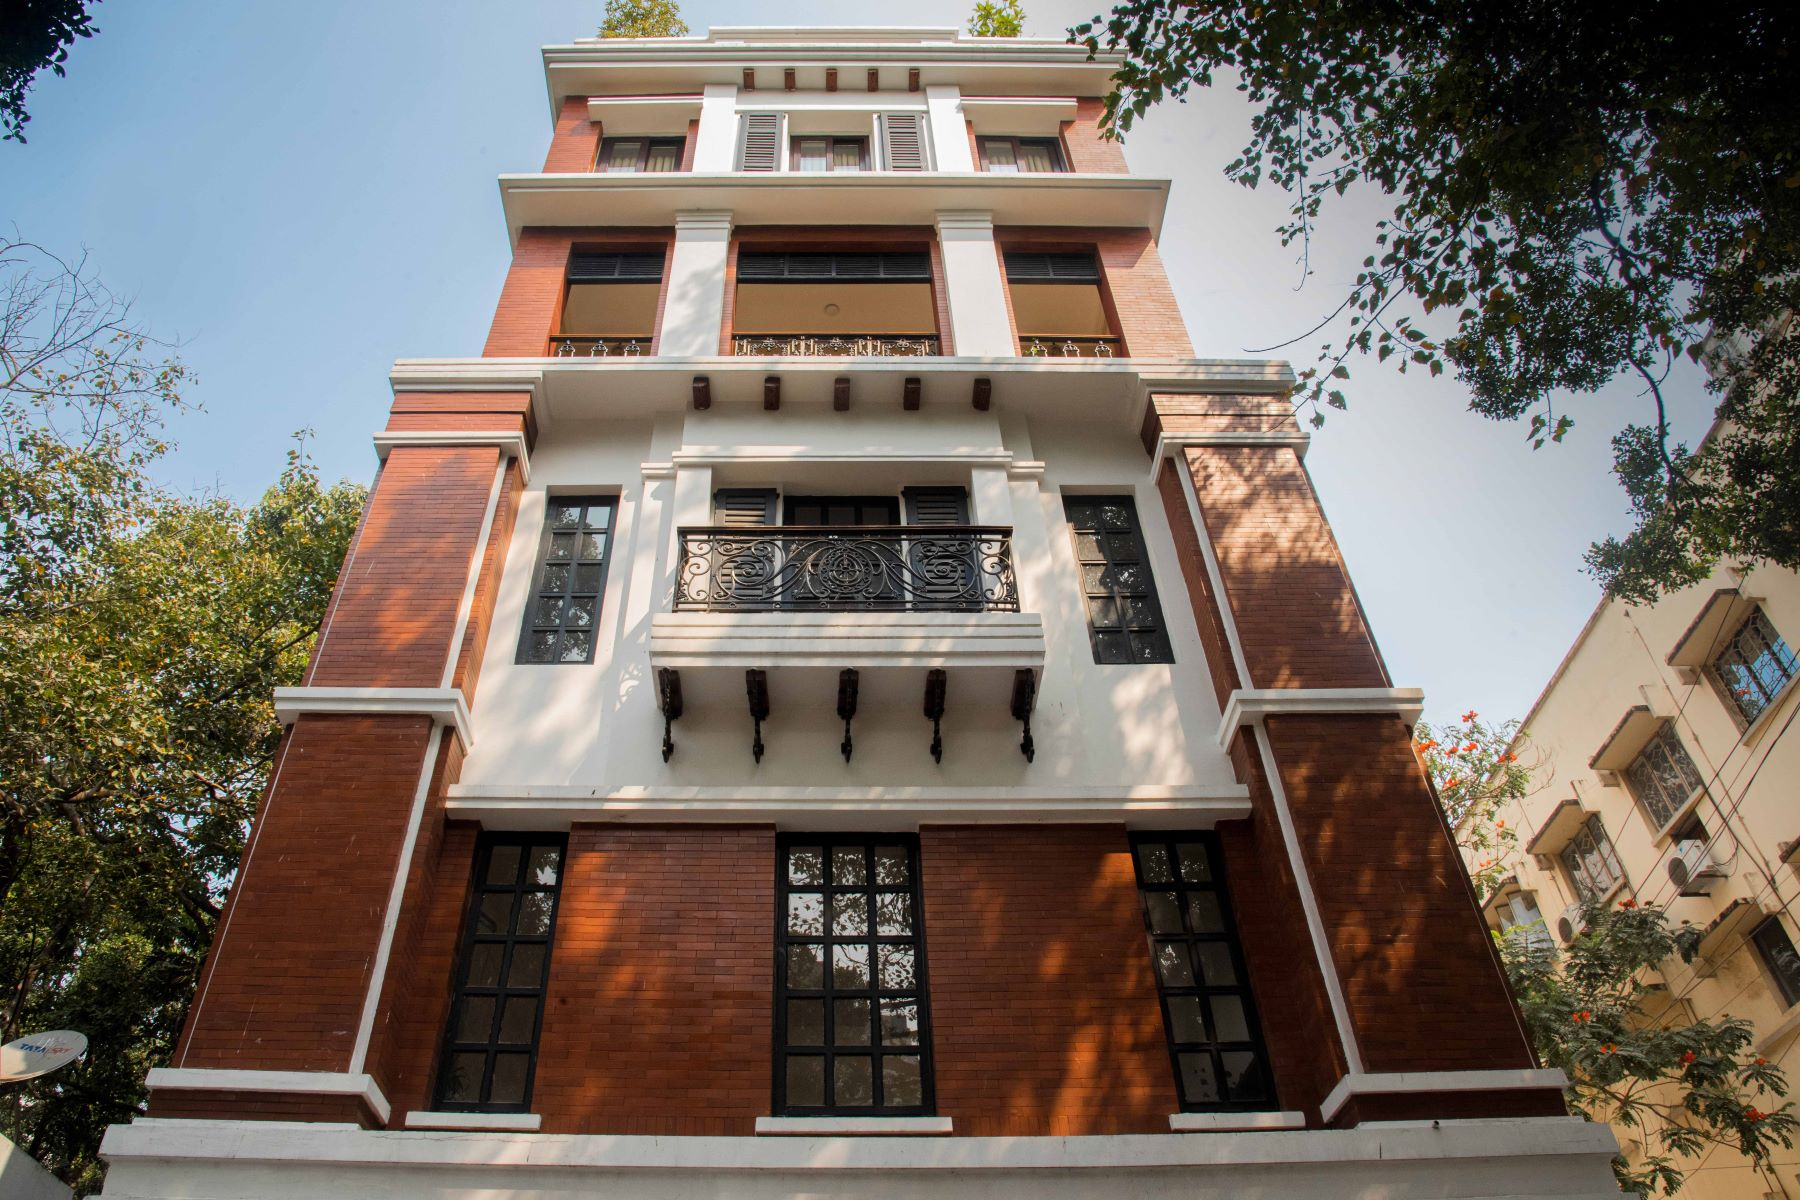 for Sale at Apartment in Ho Chi Minh Sarani Ho Chi Minh Sarani Camac Street Kolkata, West Bengal 700016 India